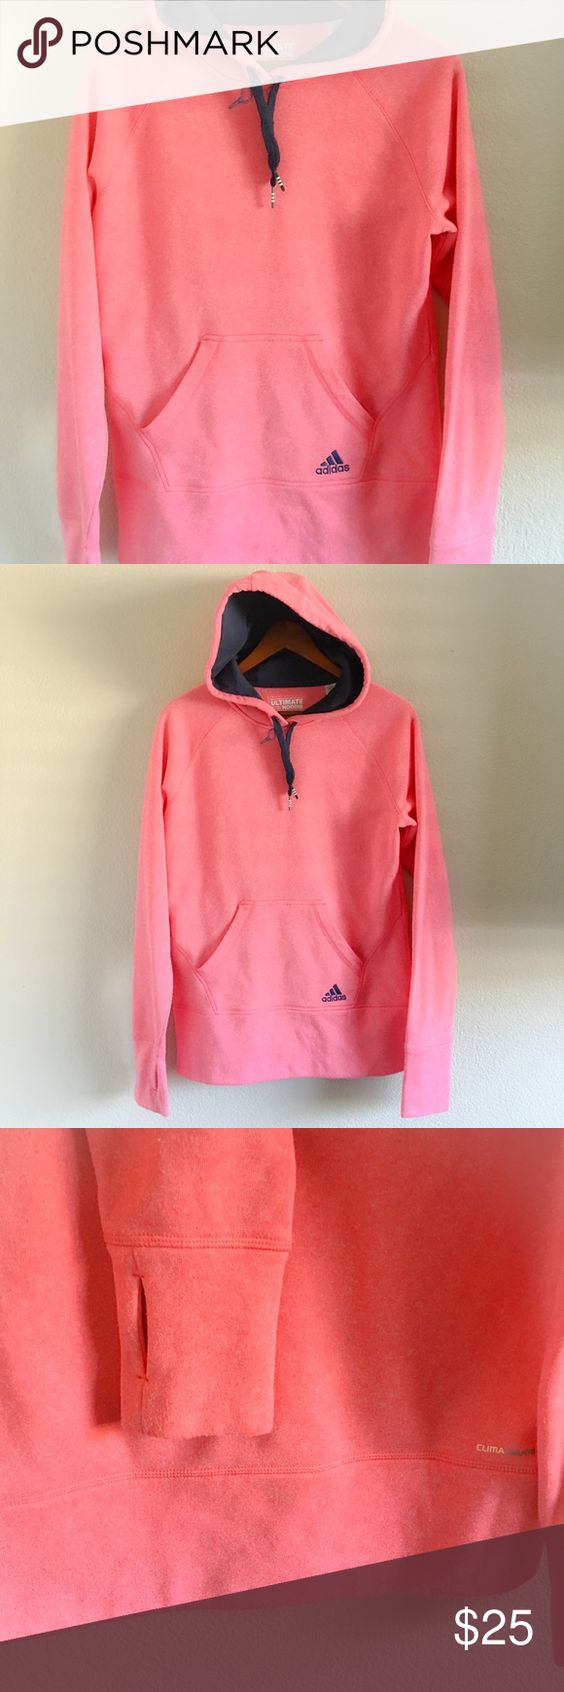 Adidas Pullover Hoodie Super soft and comfy! Ultimate Hoodie Adidas Tops Sweatshirts & Hoodies